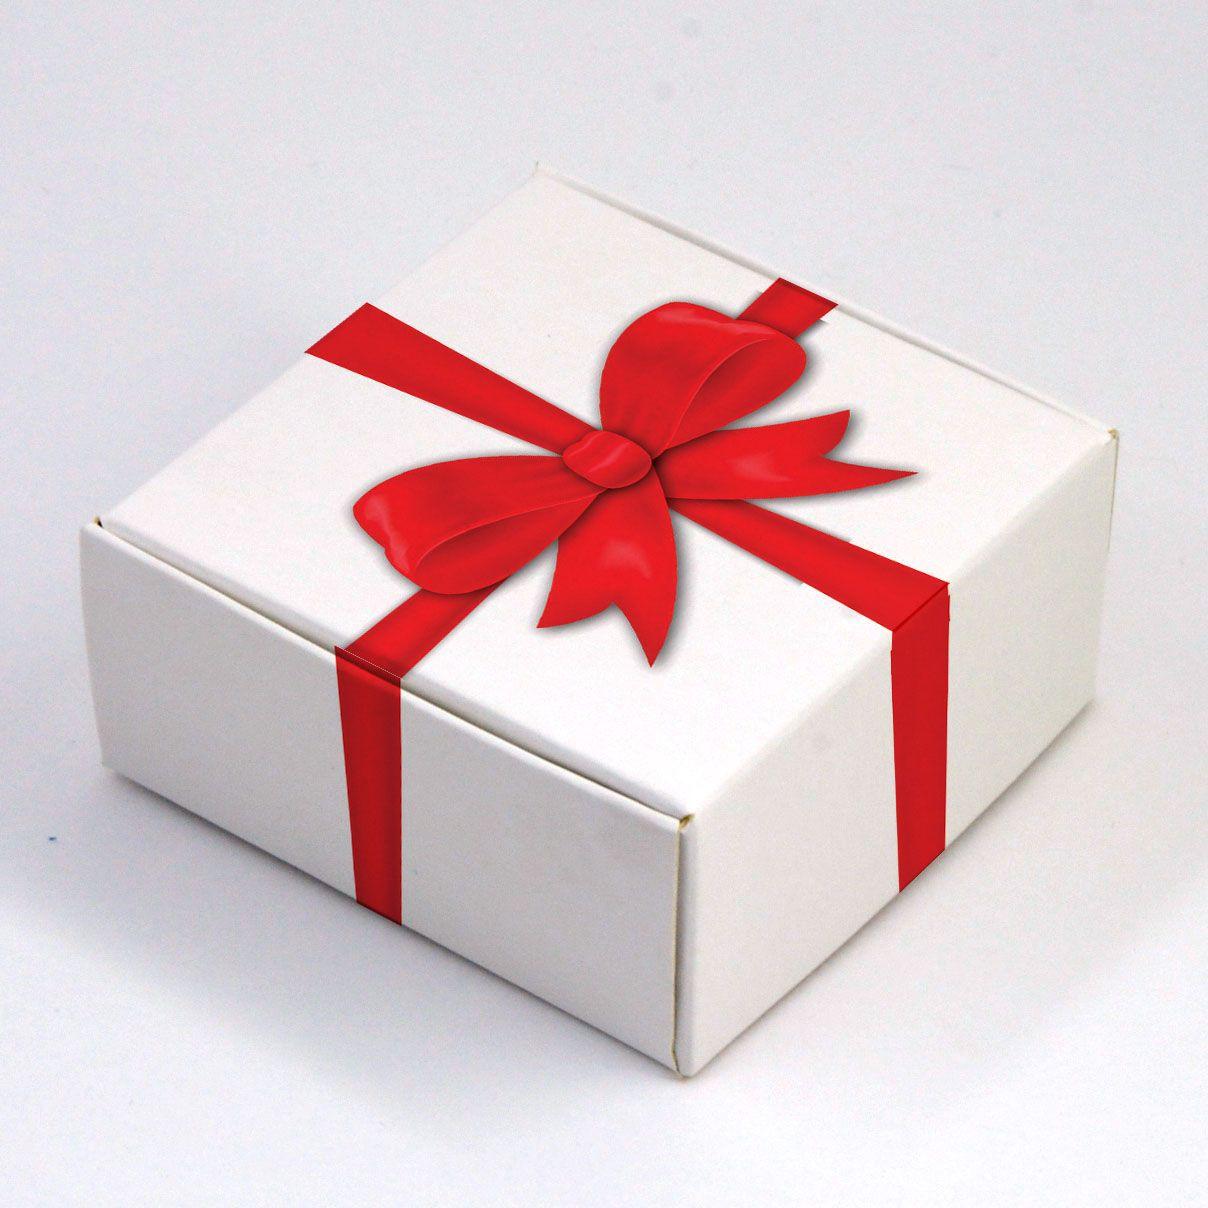 Caixa para 4 doces - Presente c/10 un